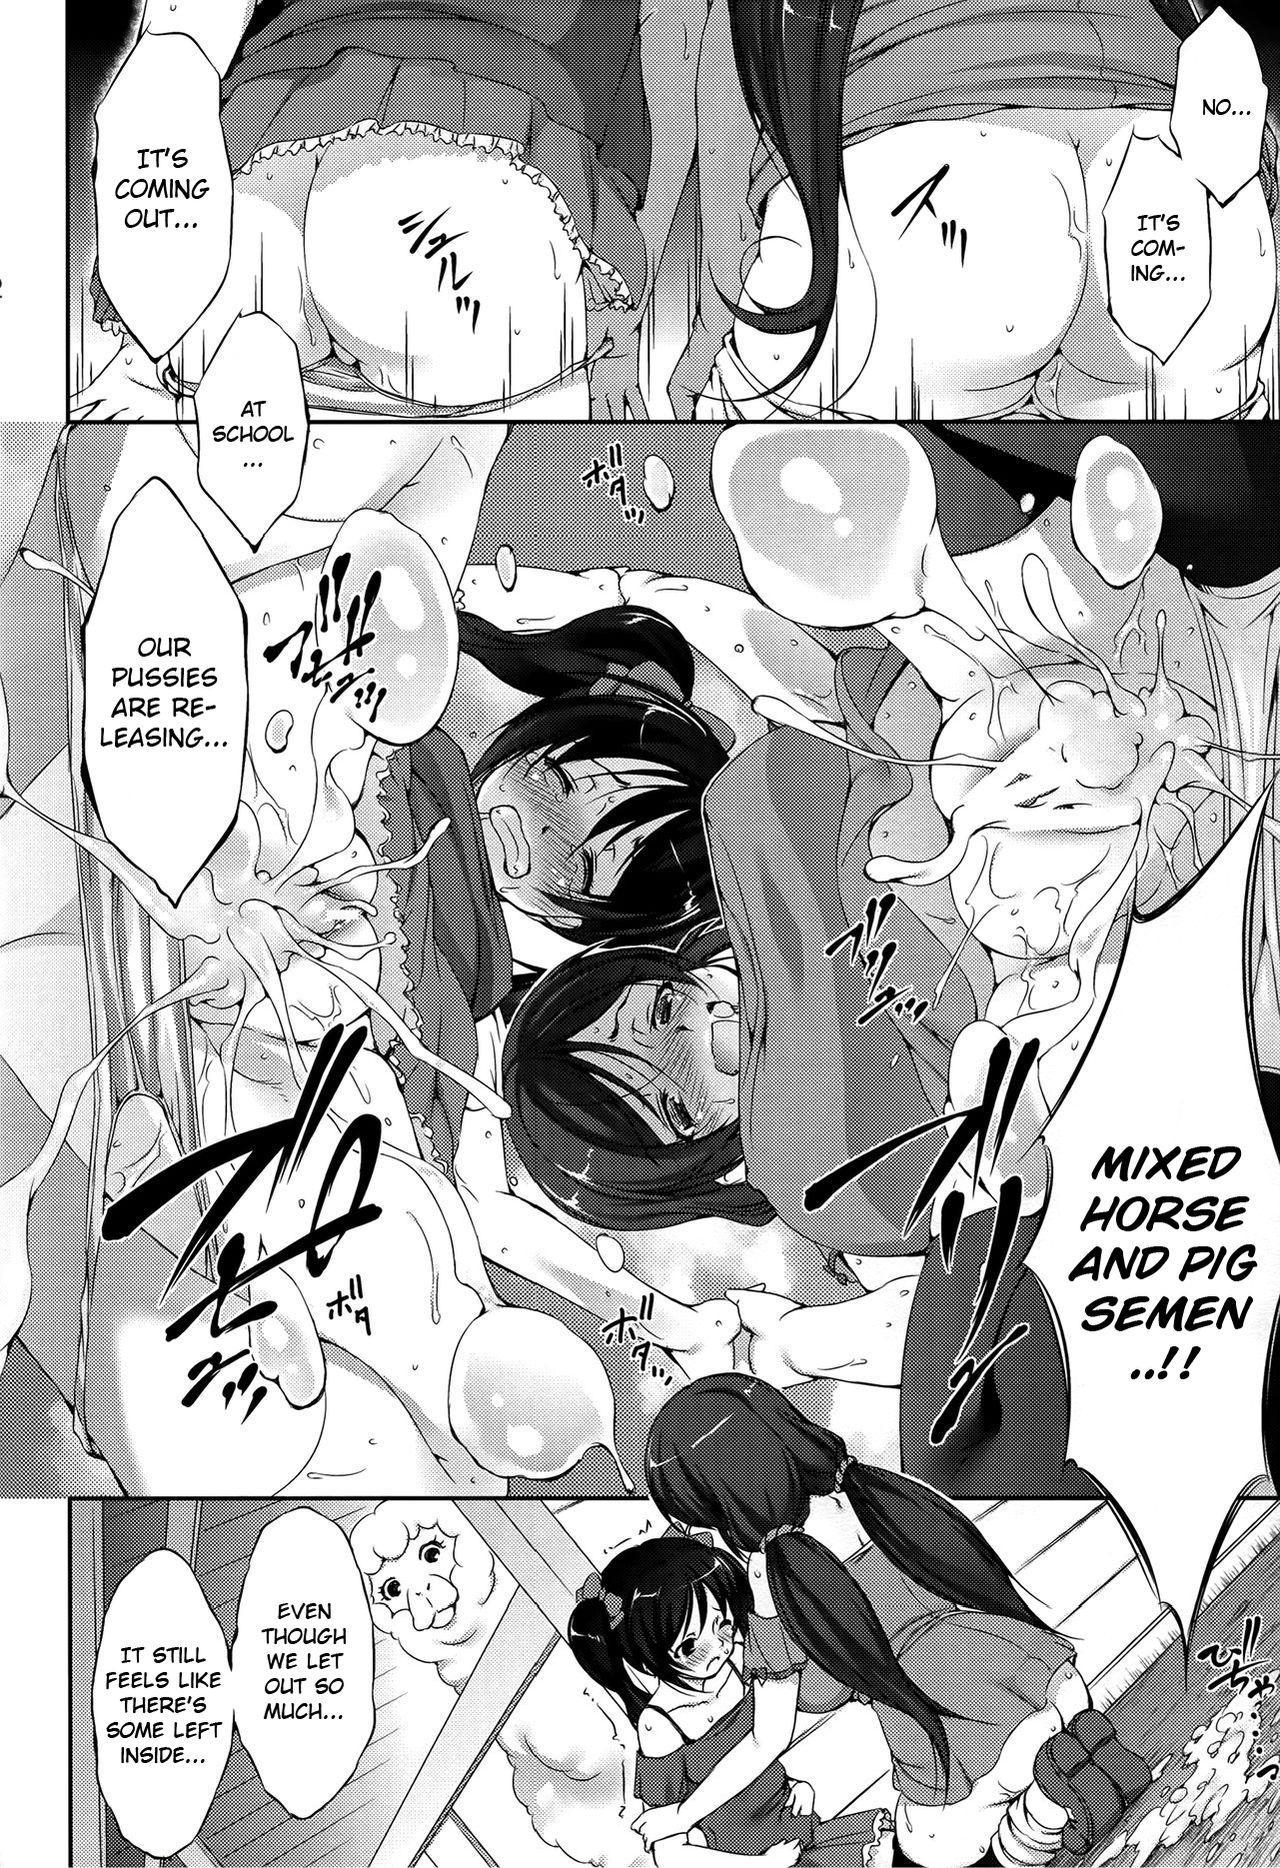 Beastality hentai Animal (Bestiality)